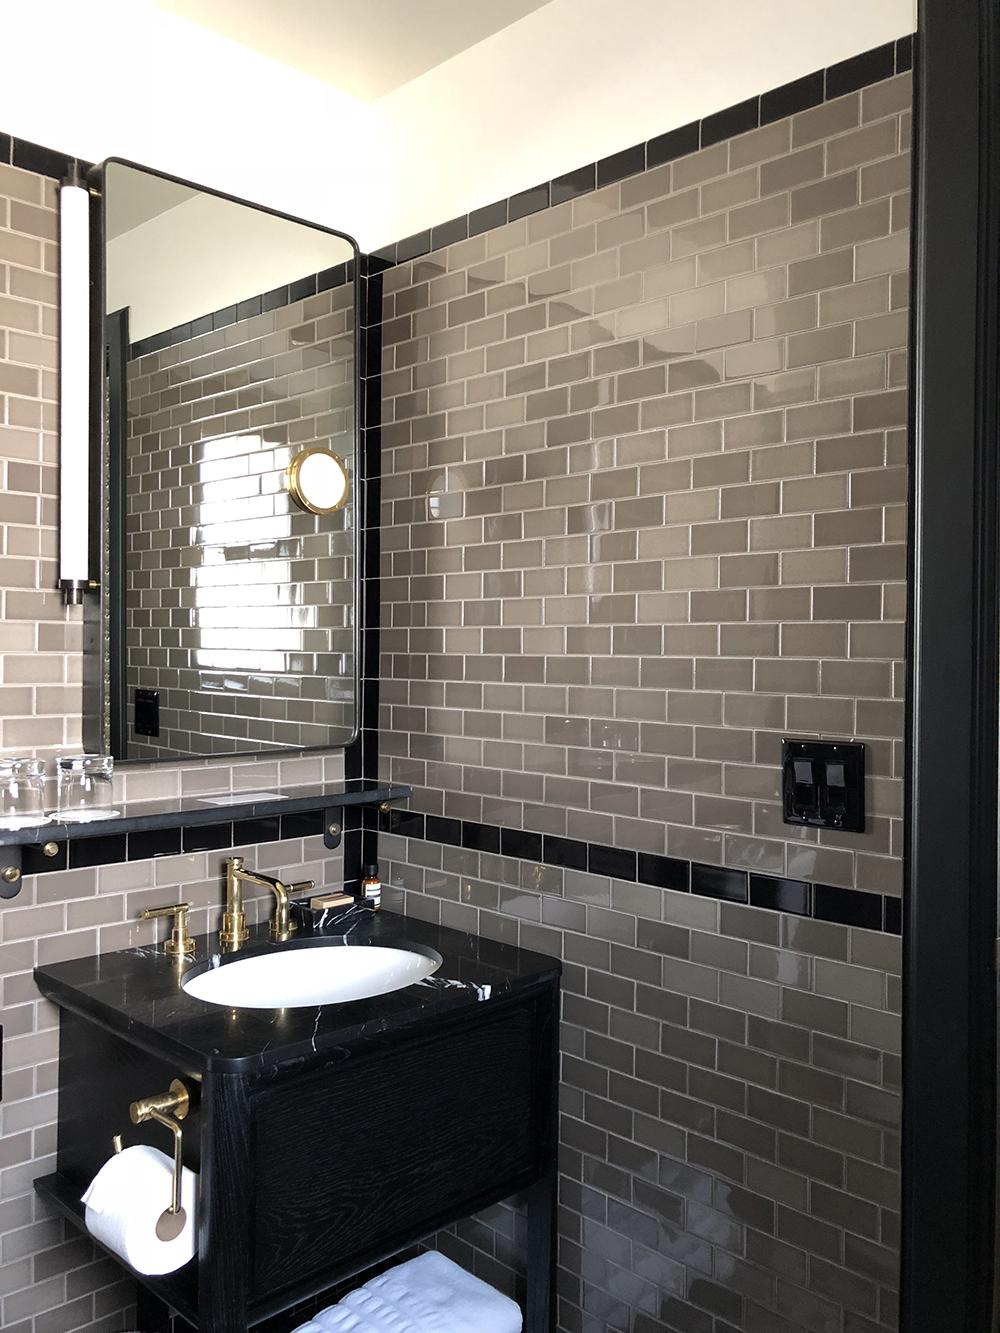 Designer Retreat Recap - roomfortuesday.com